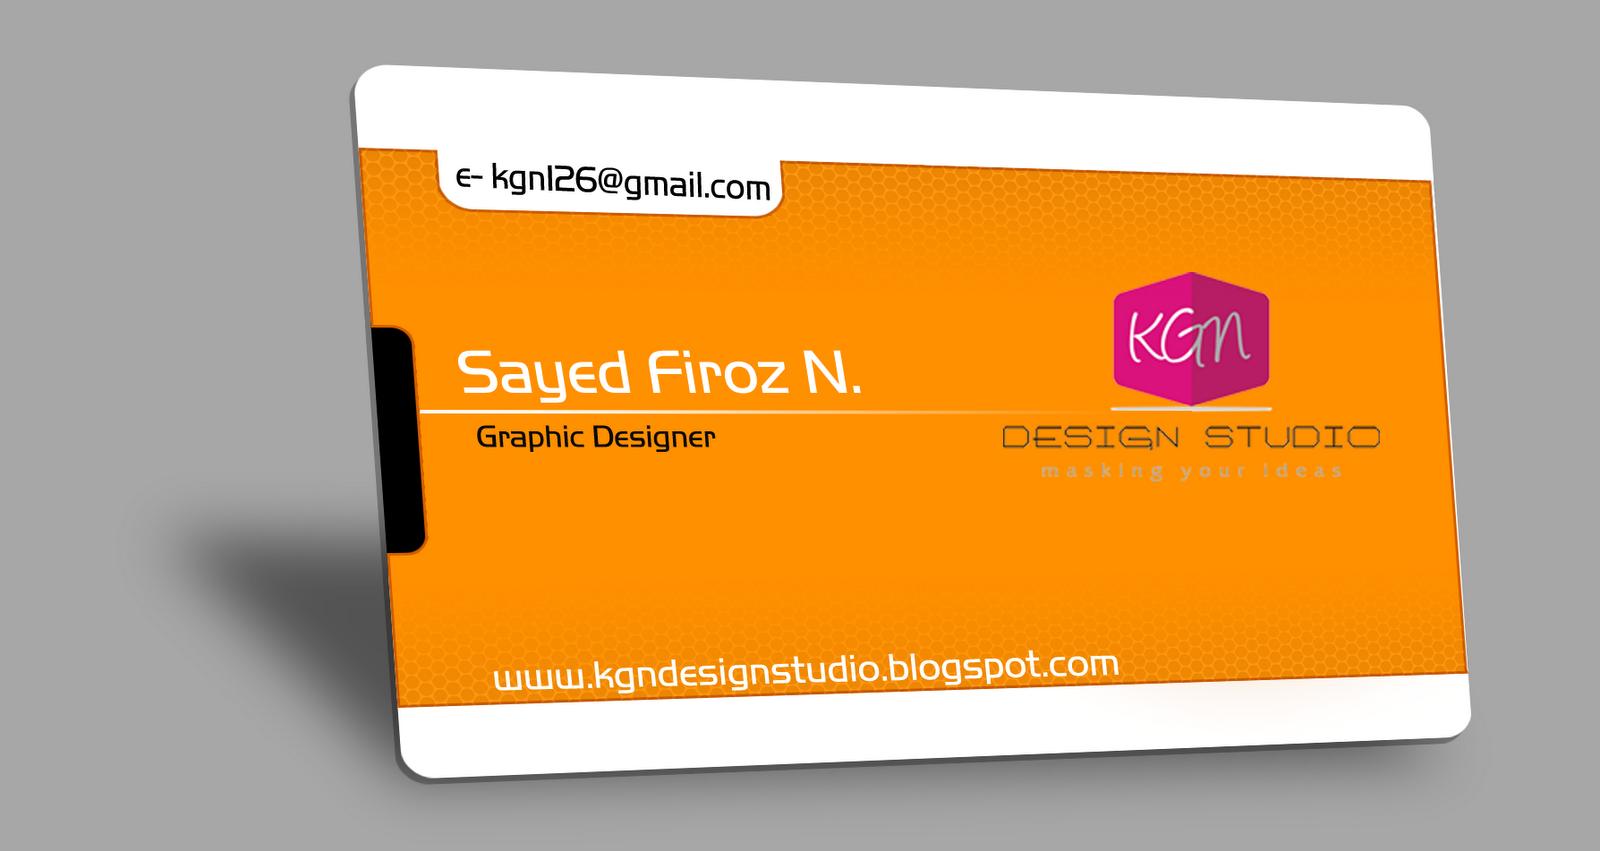 KGN Design Studio: Business Card